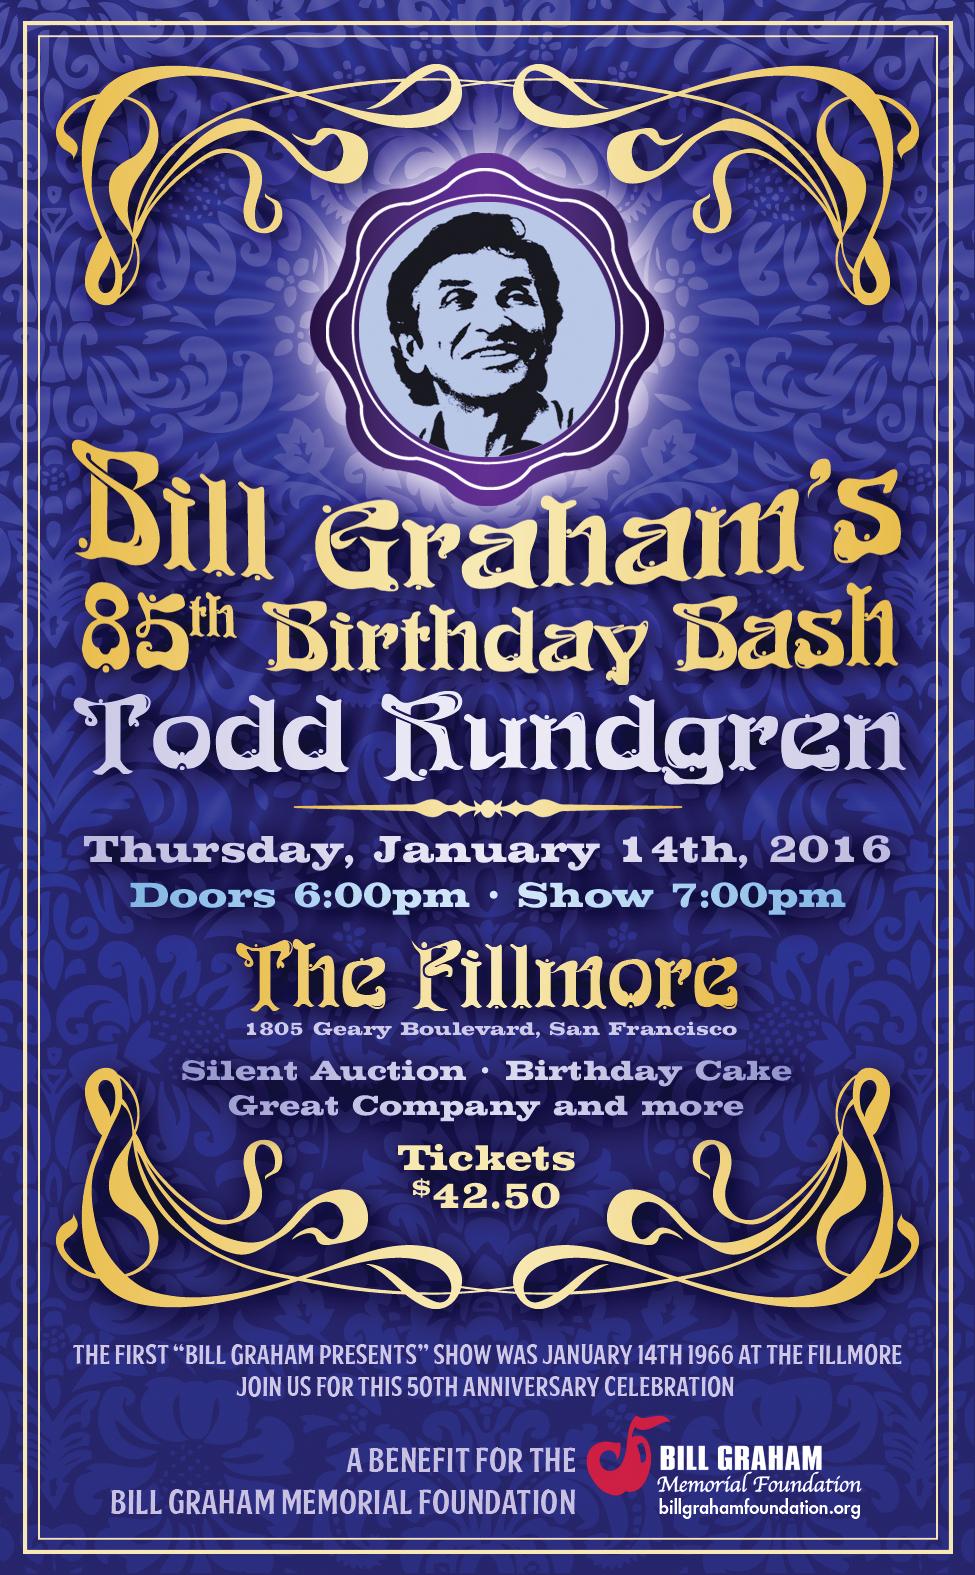 Bill Graham's 85th Birthday Bash